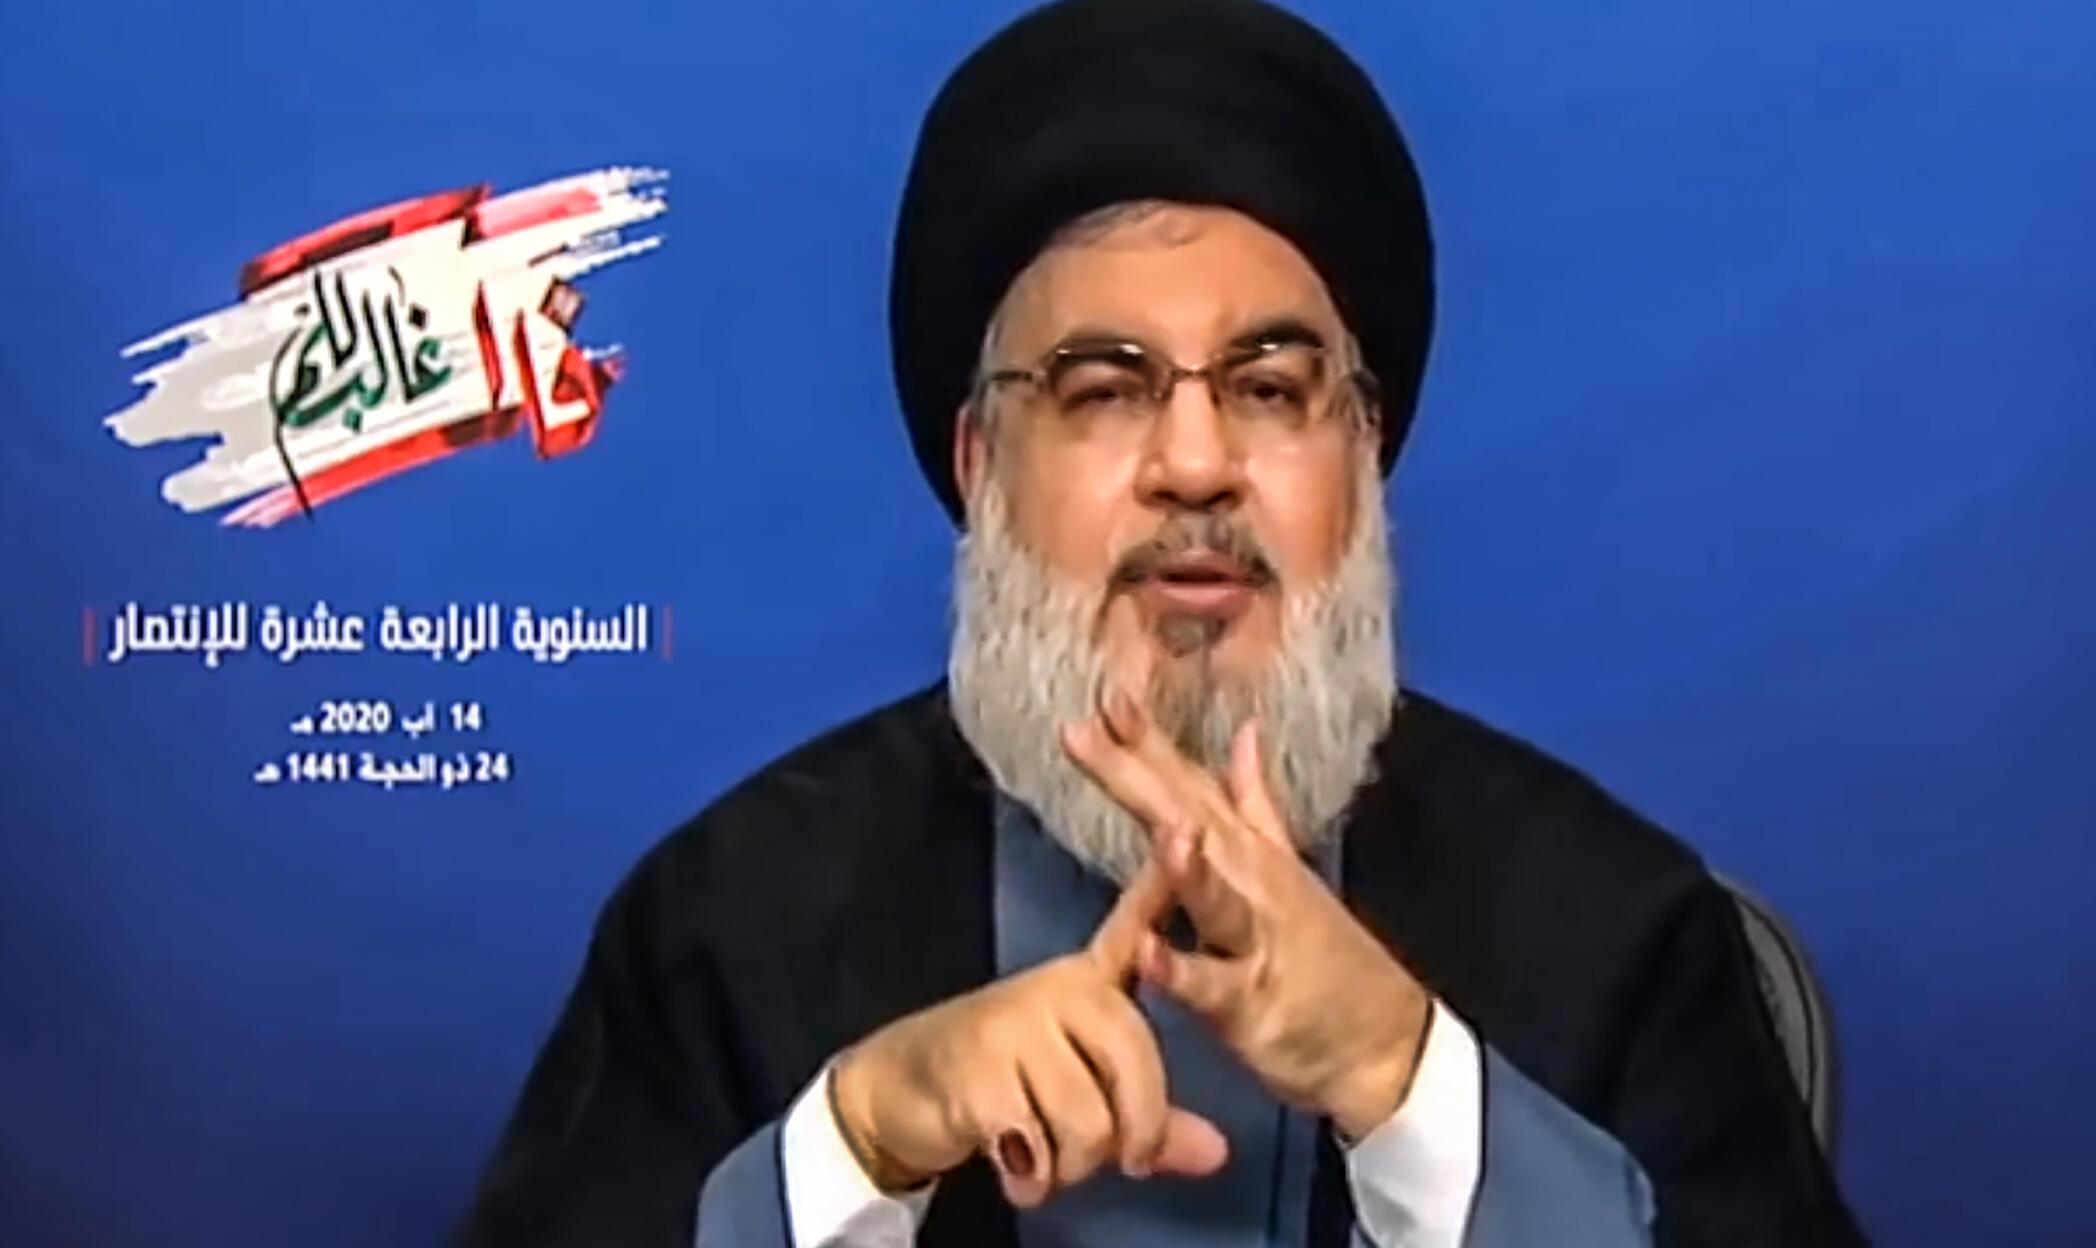 Hassan Nasrallah, o líder do partido pró-iraniano Hezbollah, em Beirute, no Líbano.